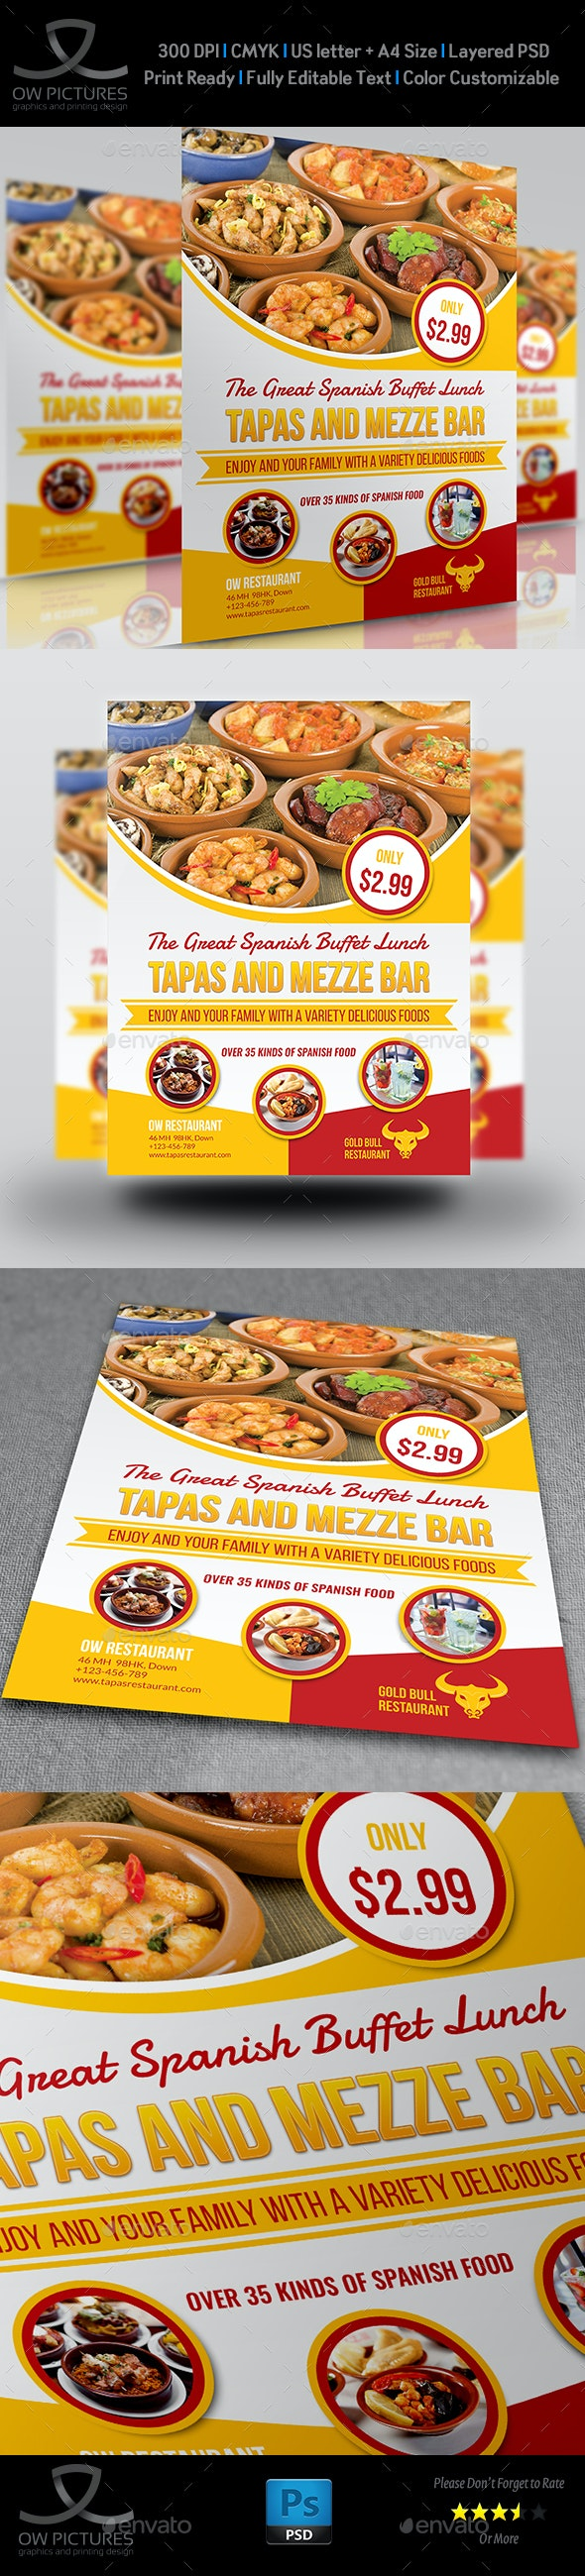 Restaurant Flyer Template Vol.14 - Restaurant Flyers